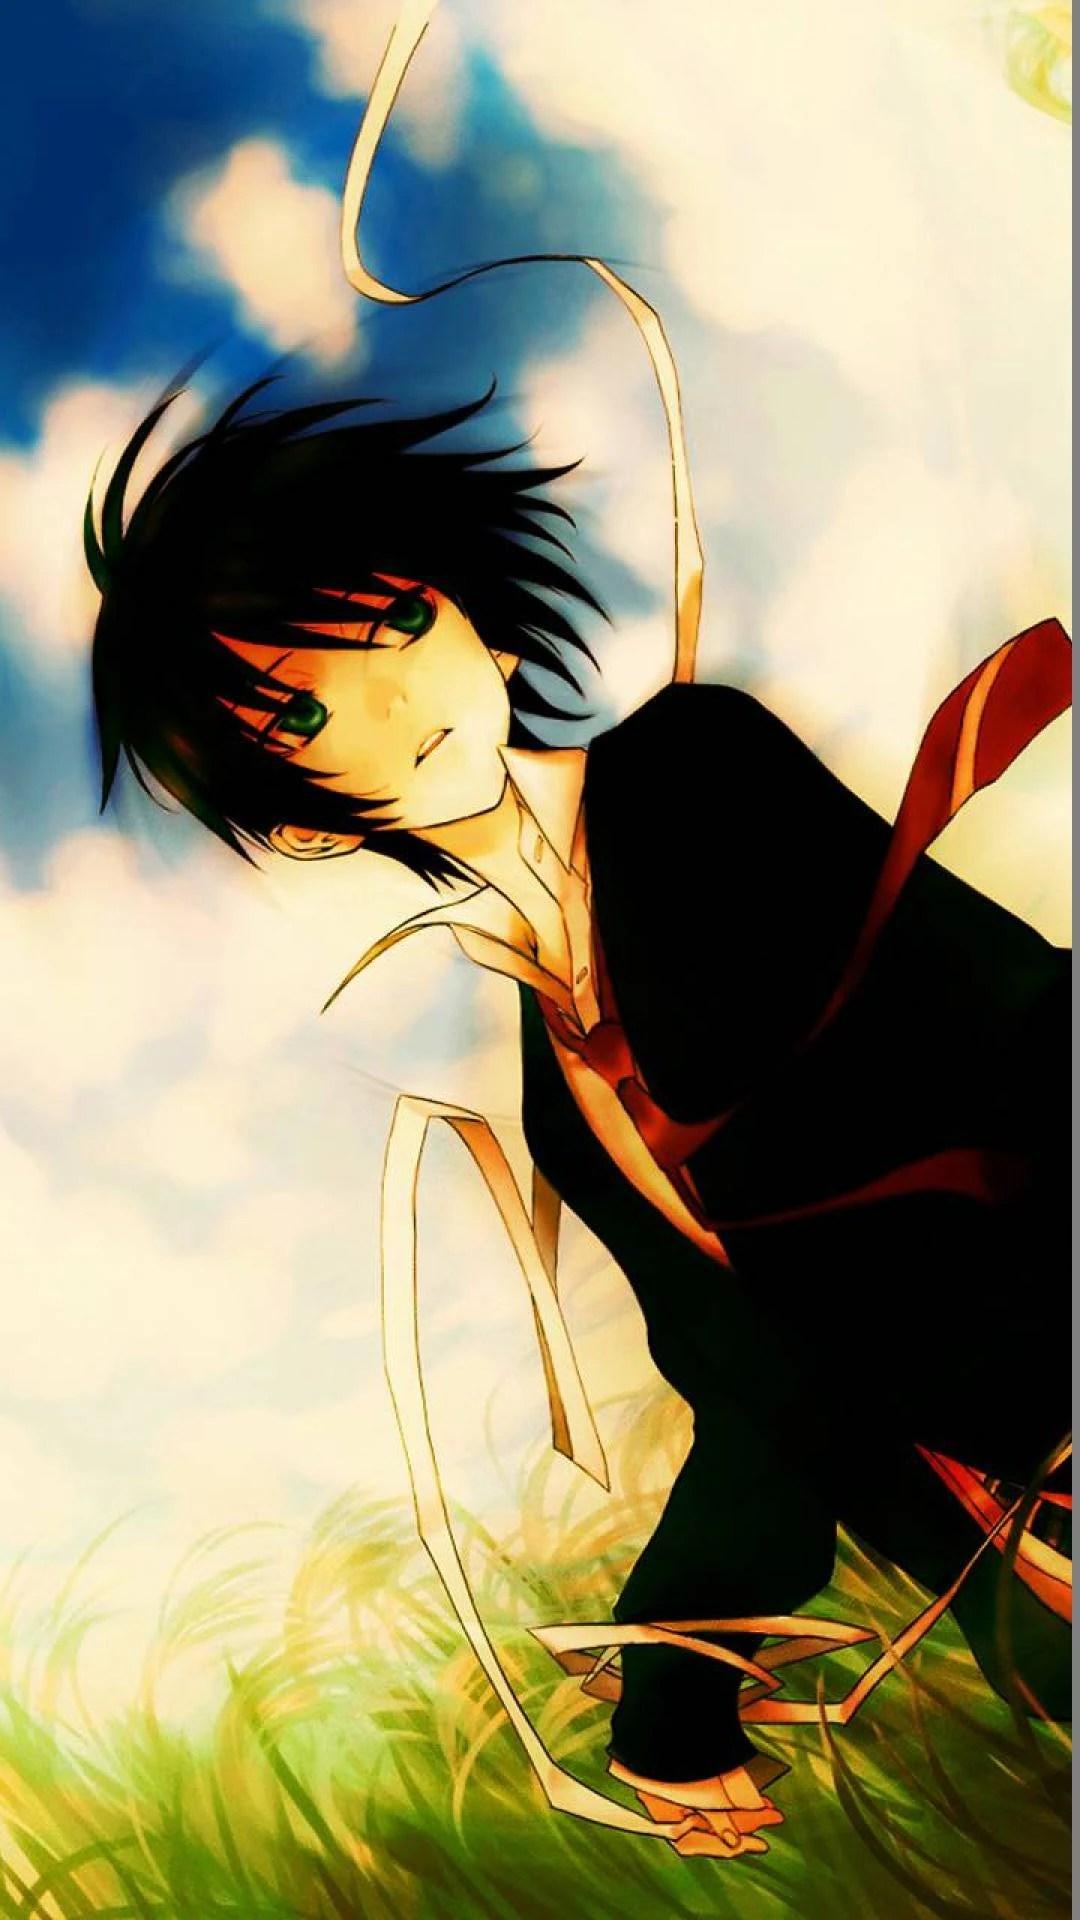 Lonely Emo Girl Hd Wallpaper Soku Takori Naruto Profile Wiki Fandom Powered By Wikia